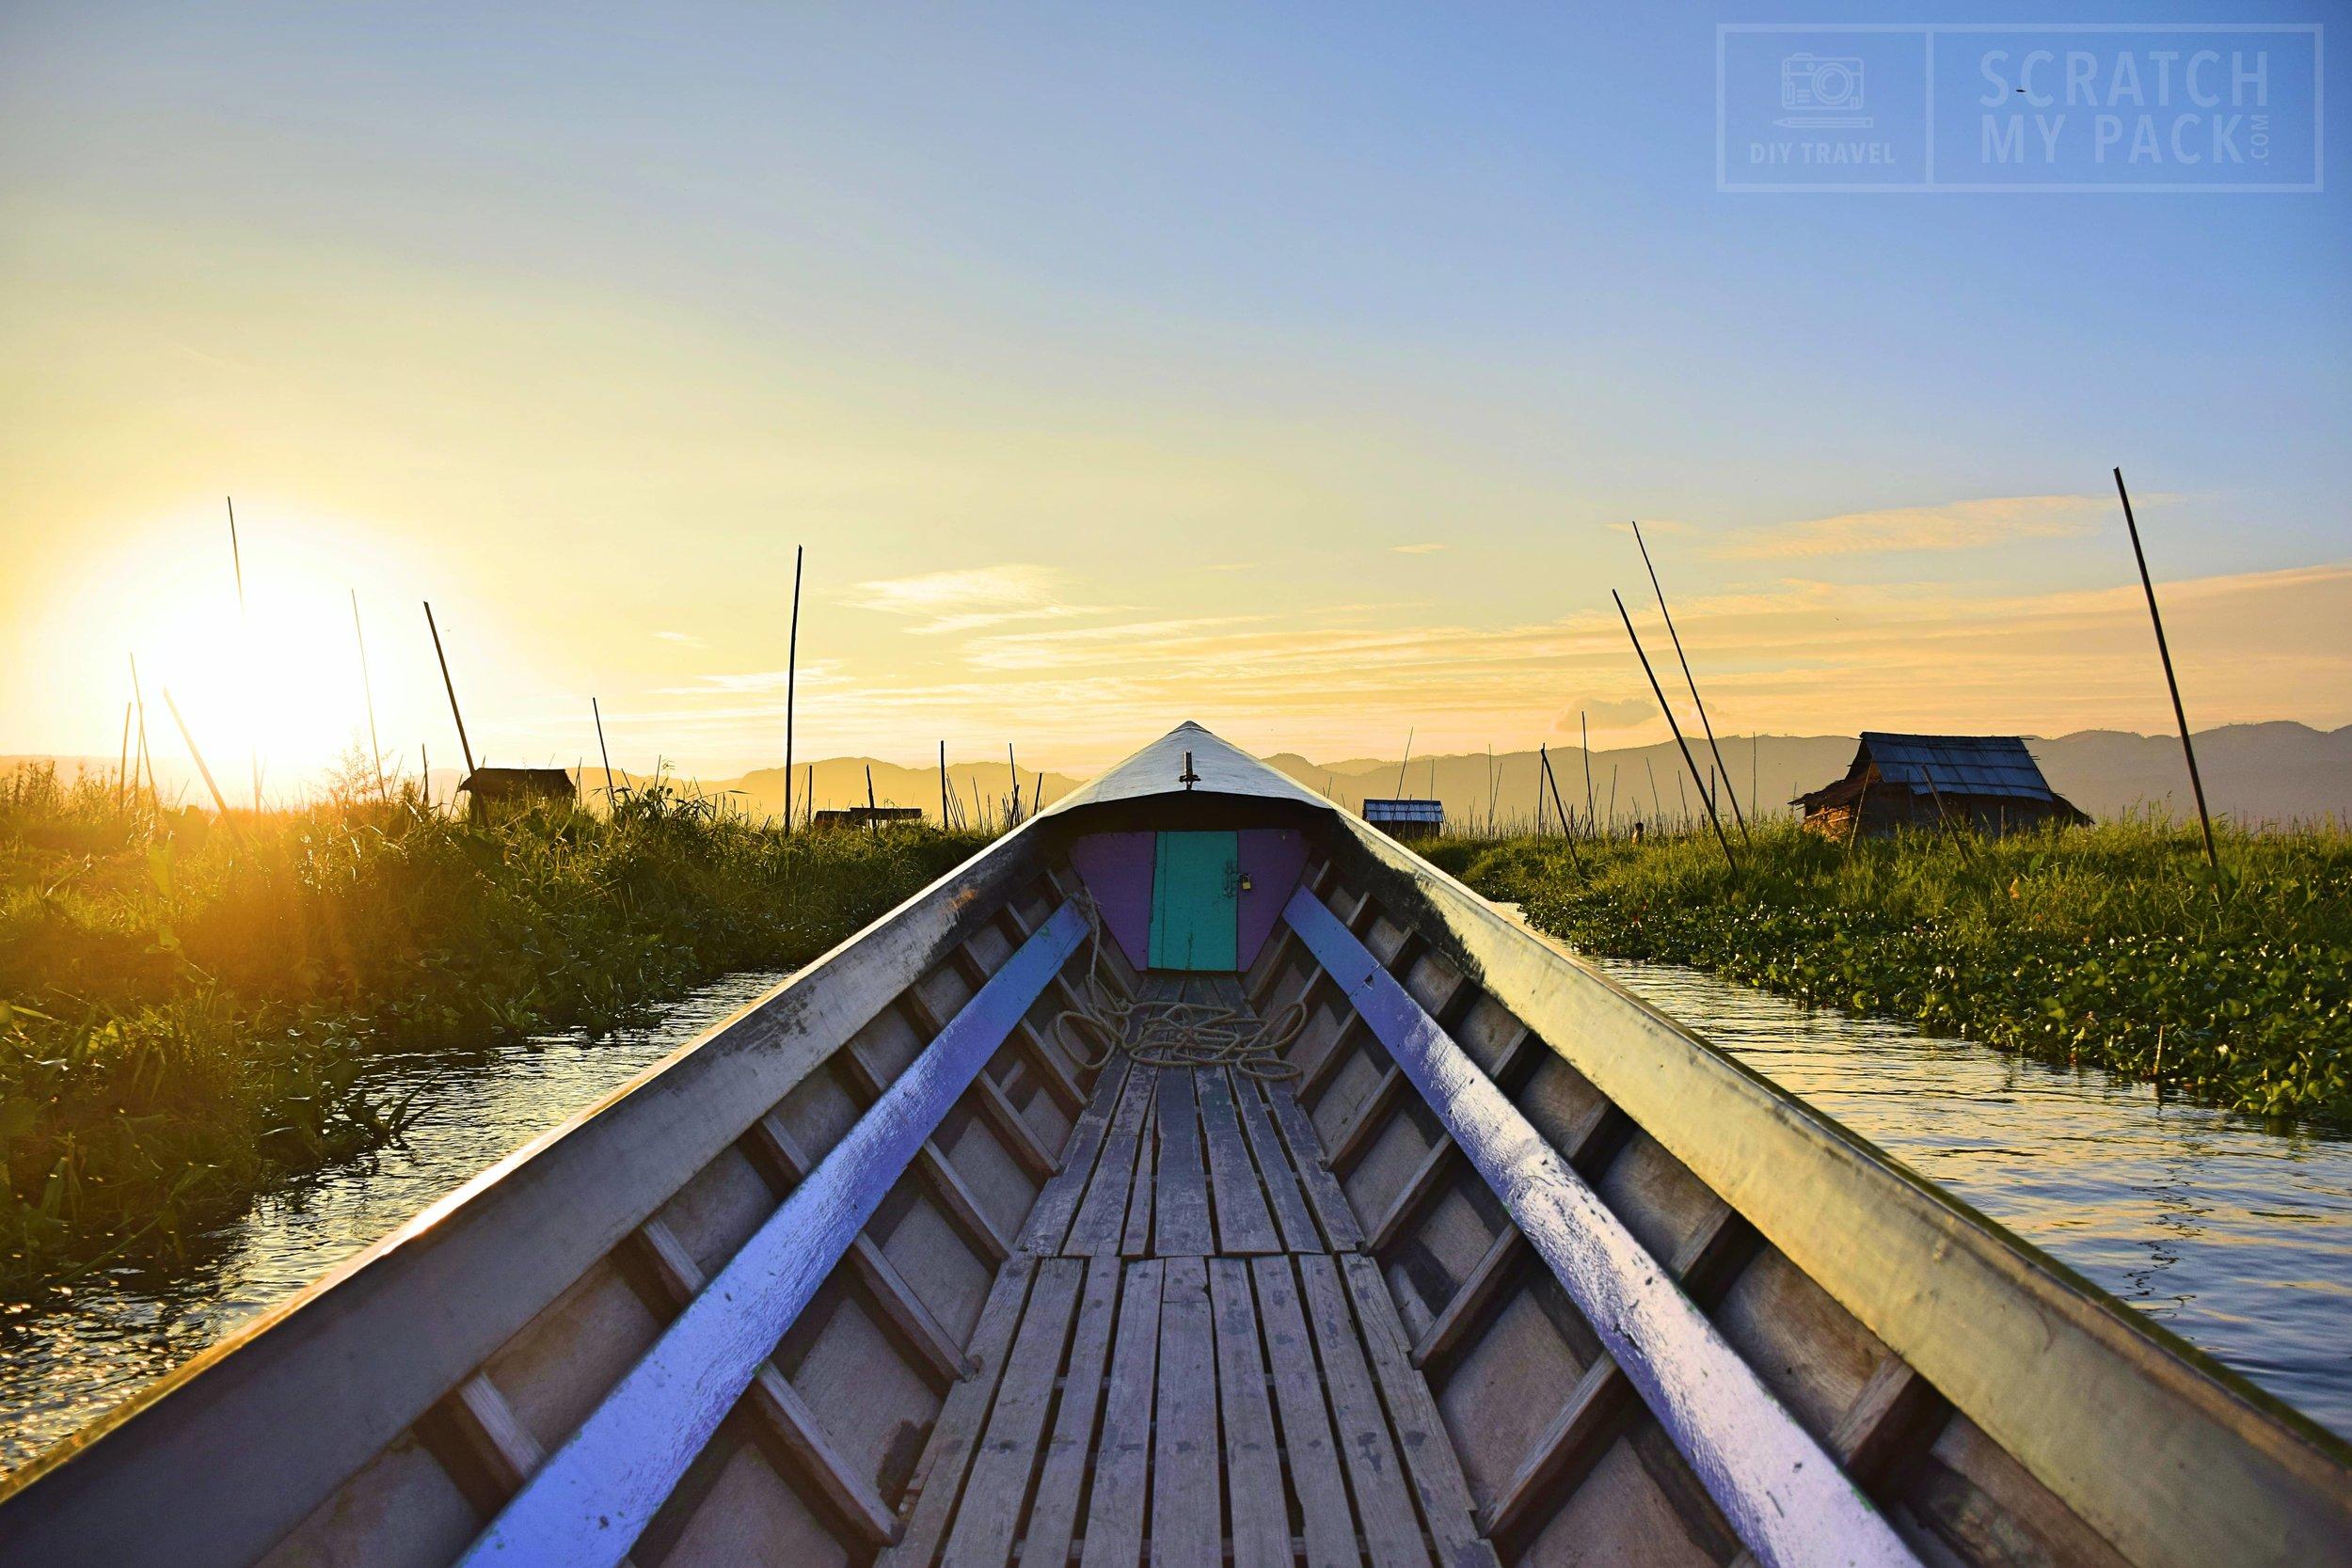 Inle Lake: Take a longboat through a floating village during sunset